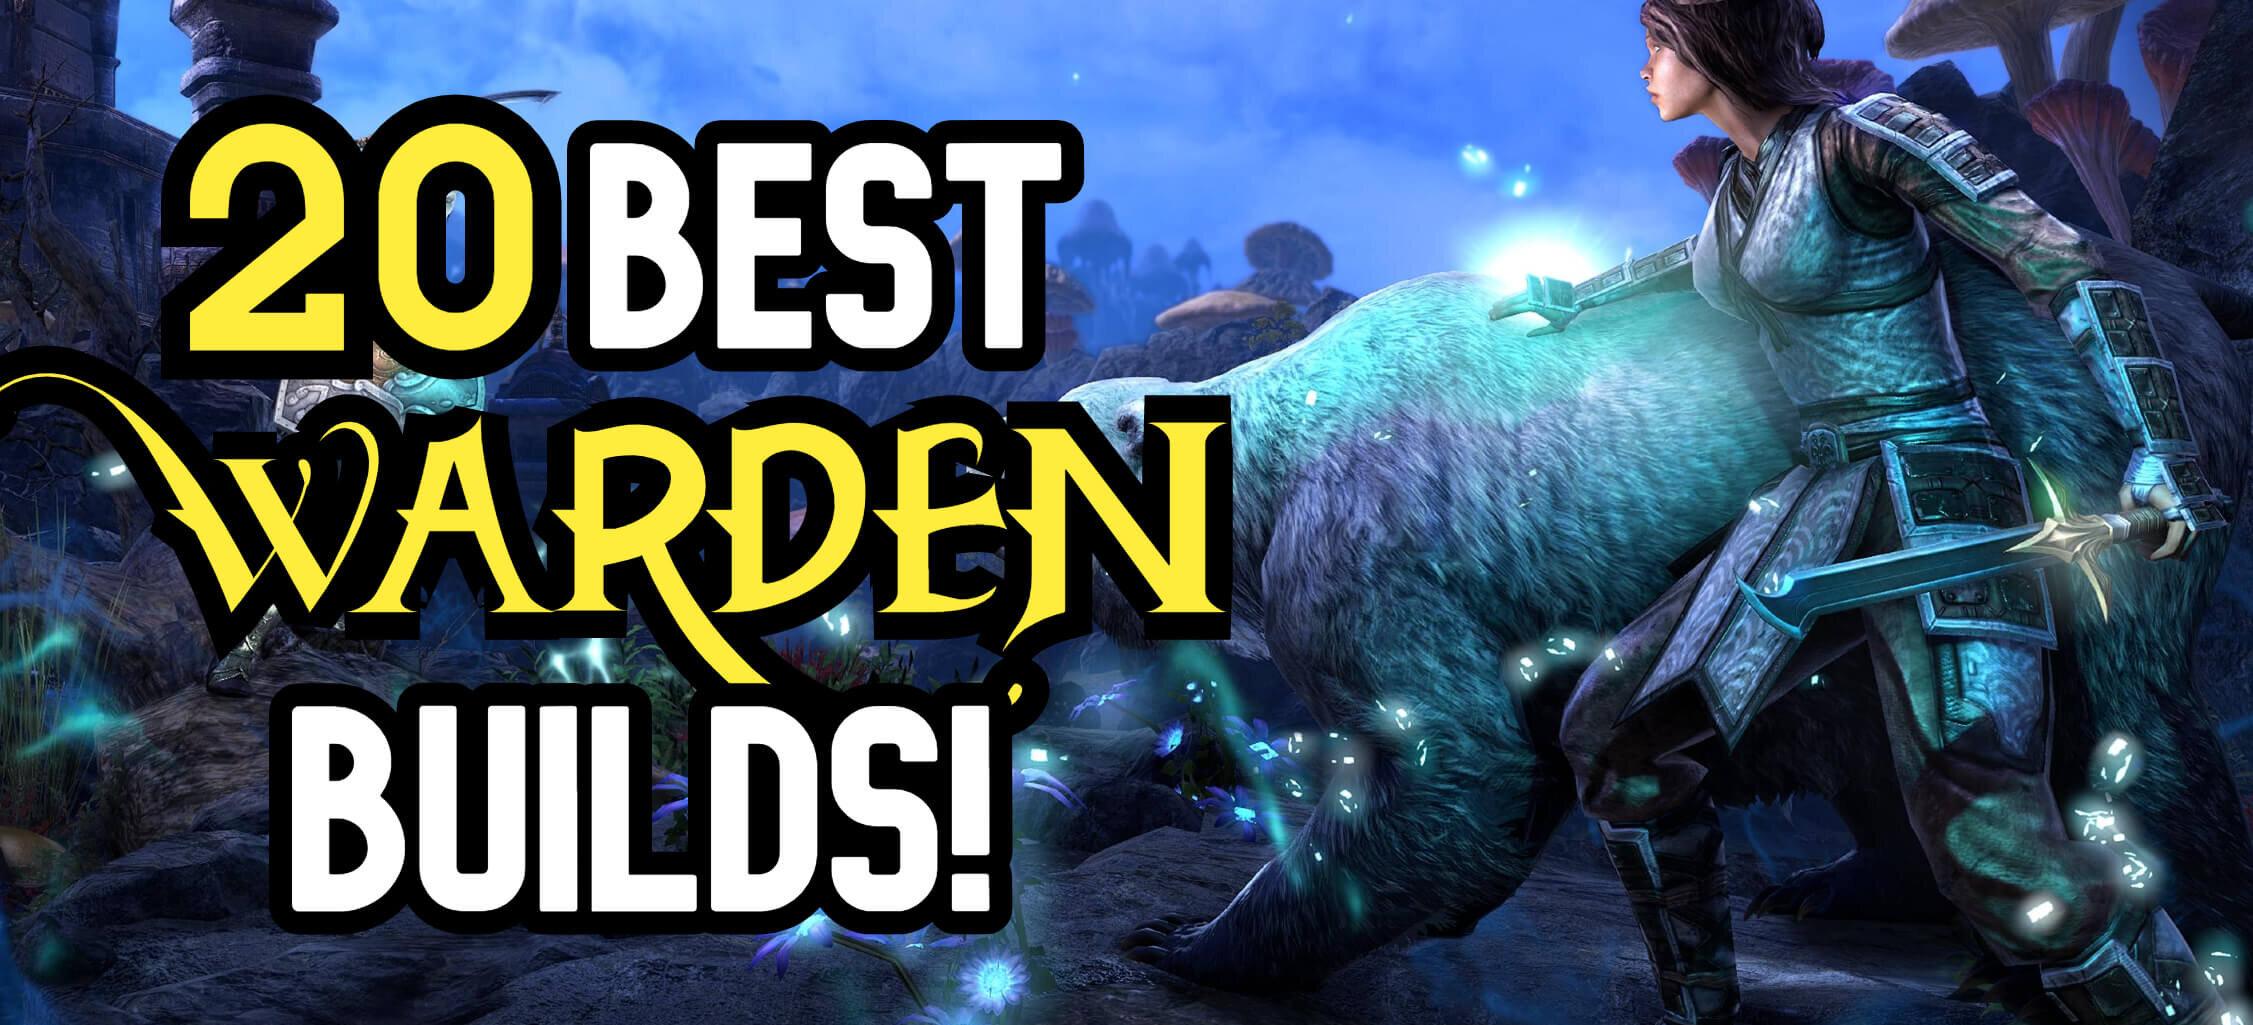 20-best-warden-builds (1).jpg